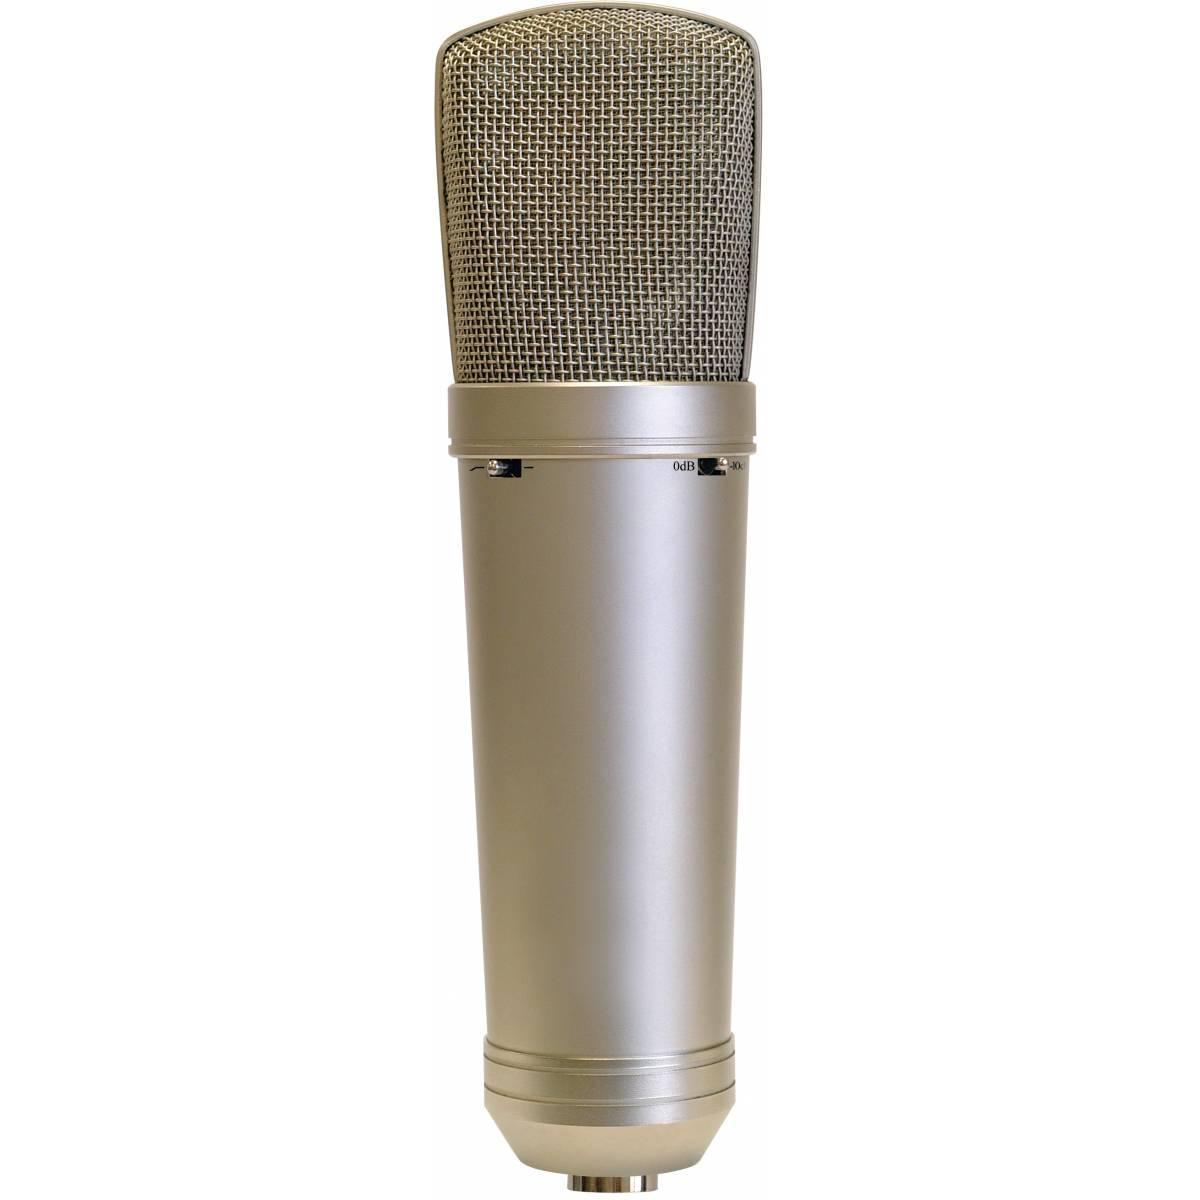 mxl 2010 condenser microphone condenser microphones from inta audio uk. Black Bedroom Furniture Sets. Home Design Ideas